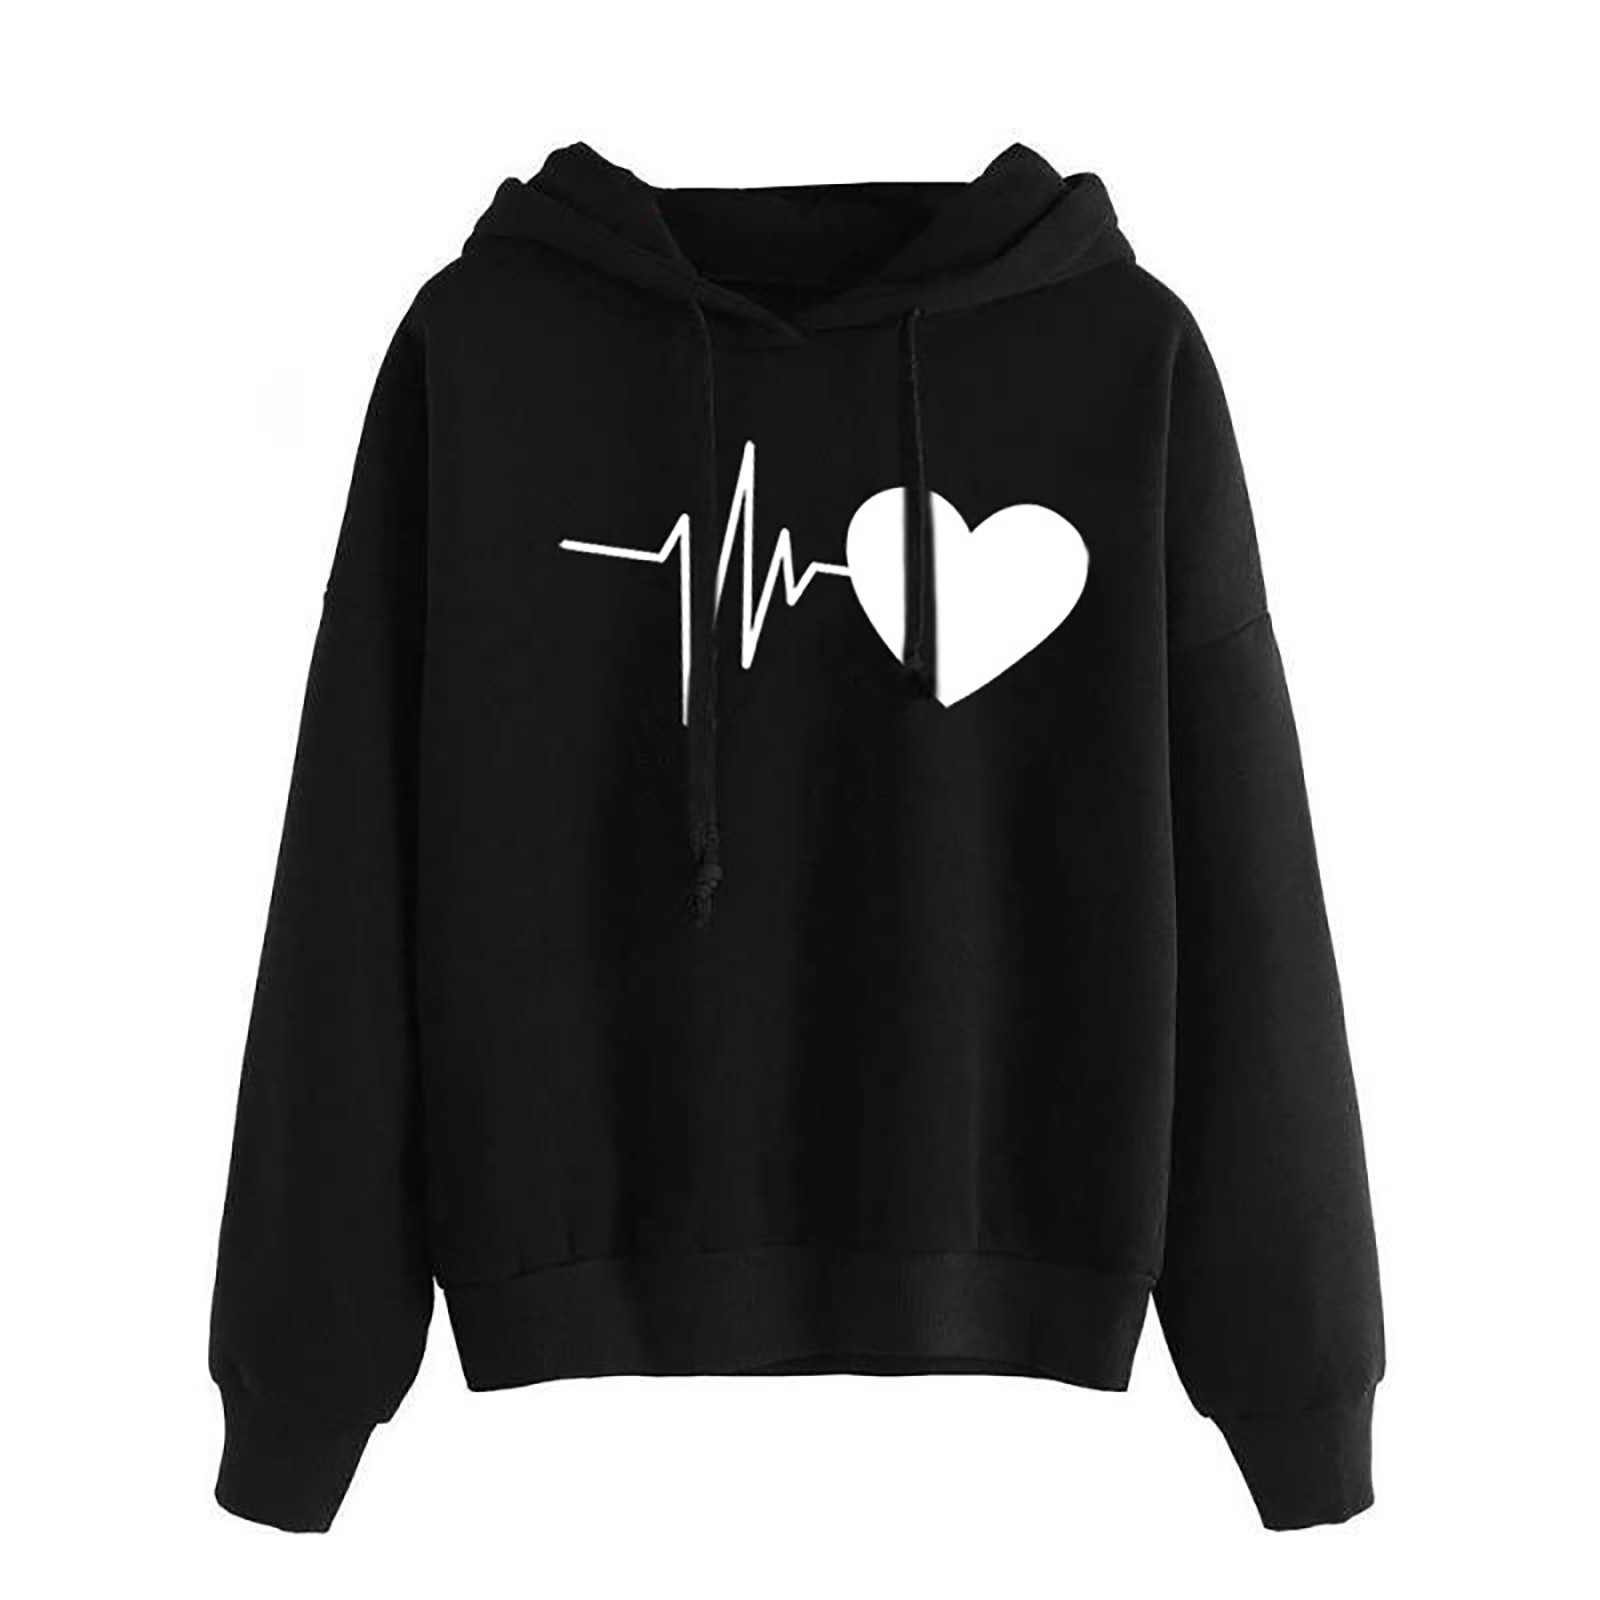 Women Hoodies Casual Love Print Solid Loose Drawstring Sweatshirt Long Sleeve Hooded 2020 Spring Autumn Female Pullover Tops 1